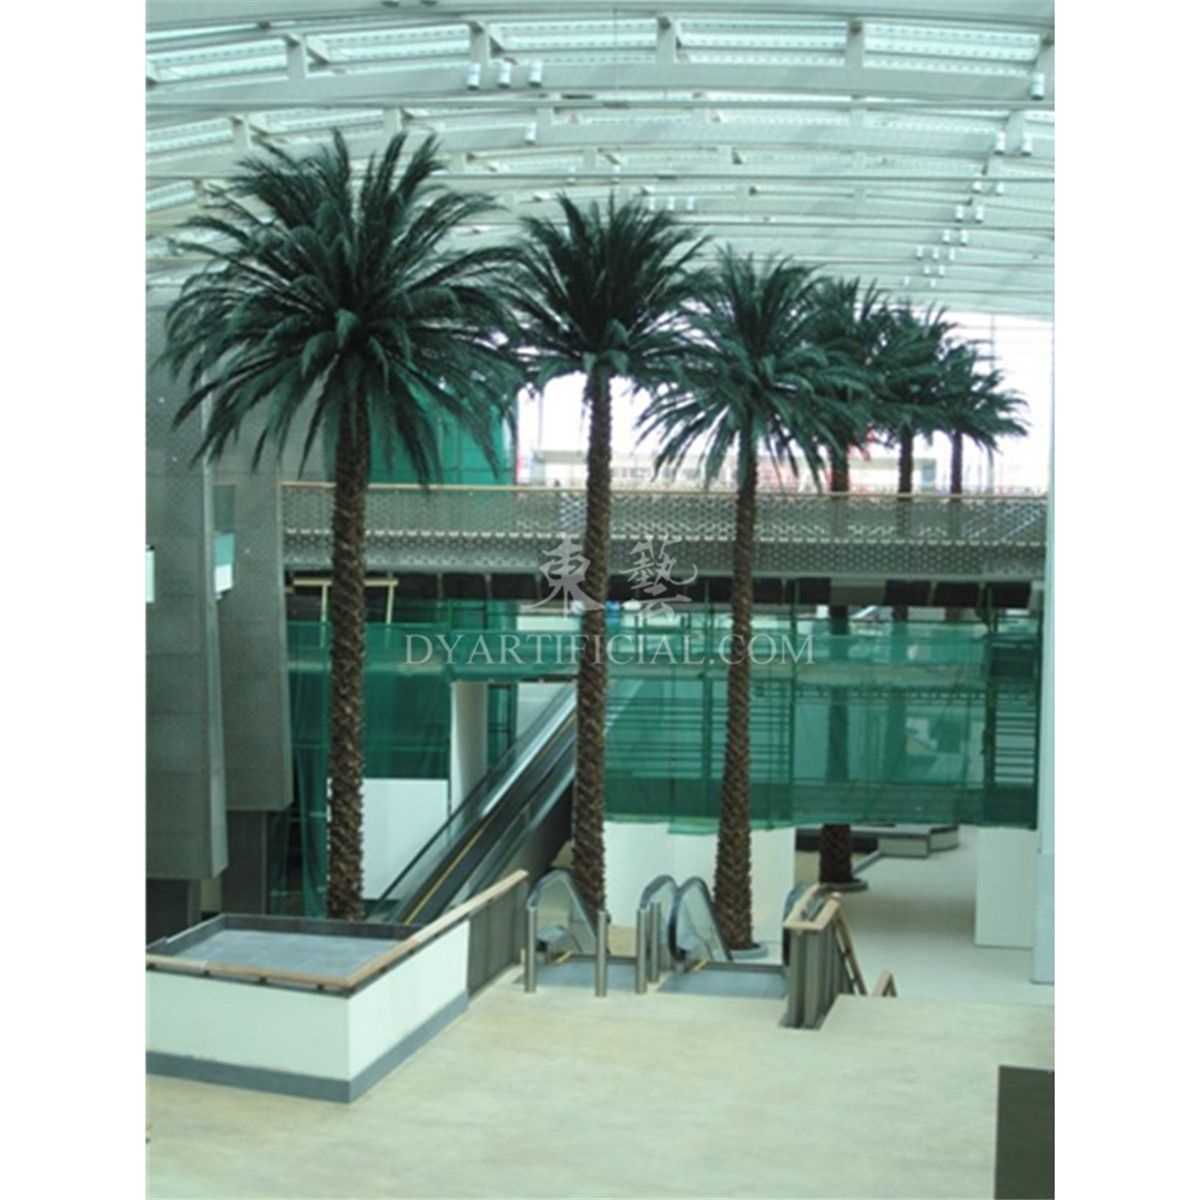 TAYZL-20 Artificial Palm Tree Made in Guangzhou China